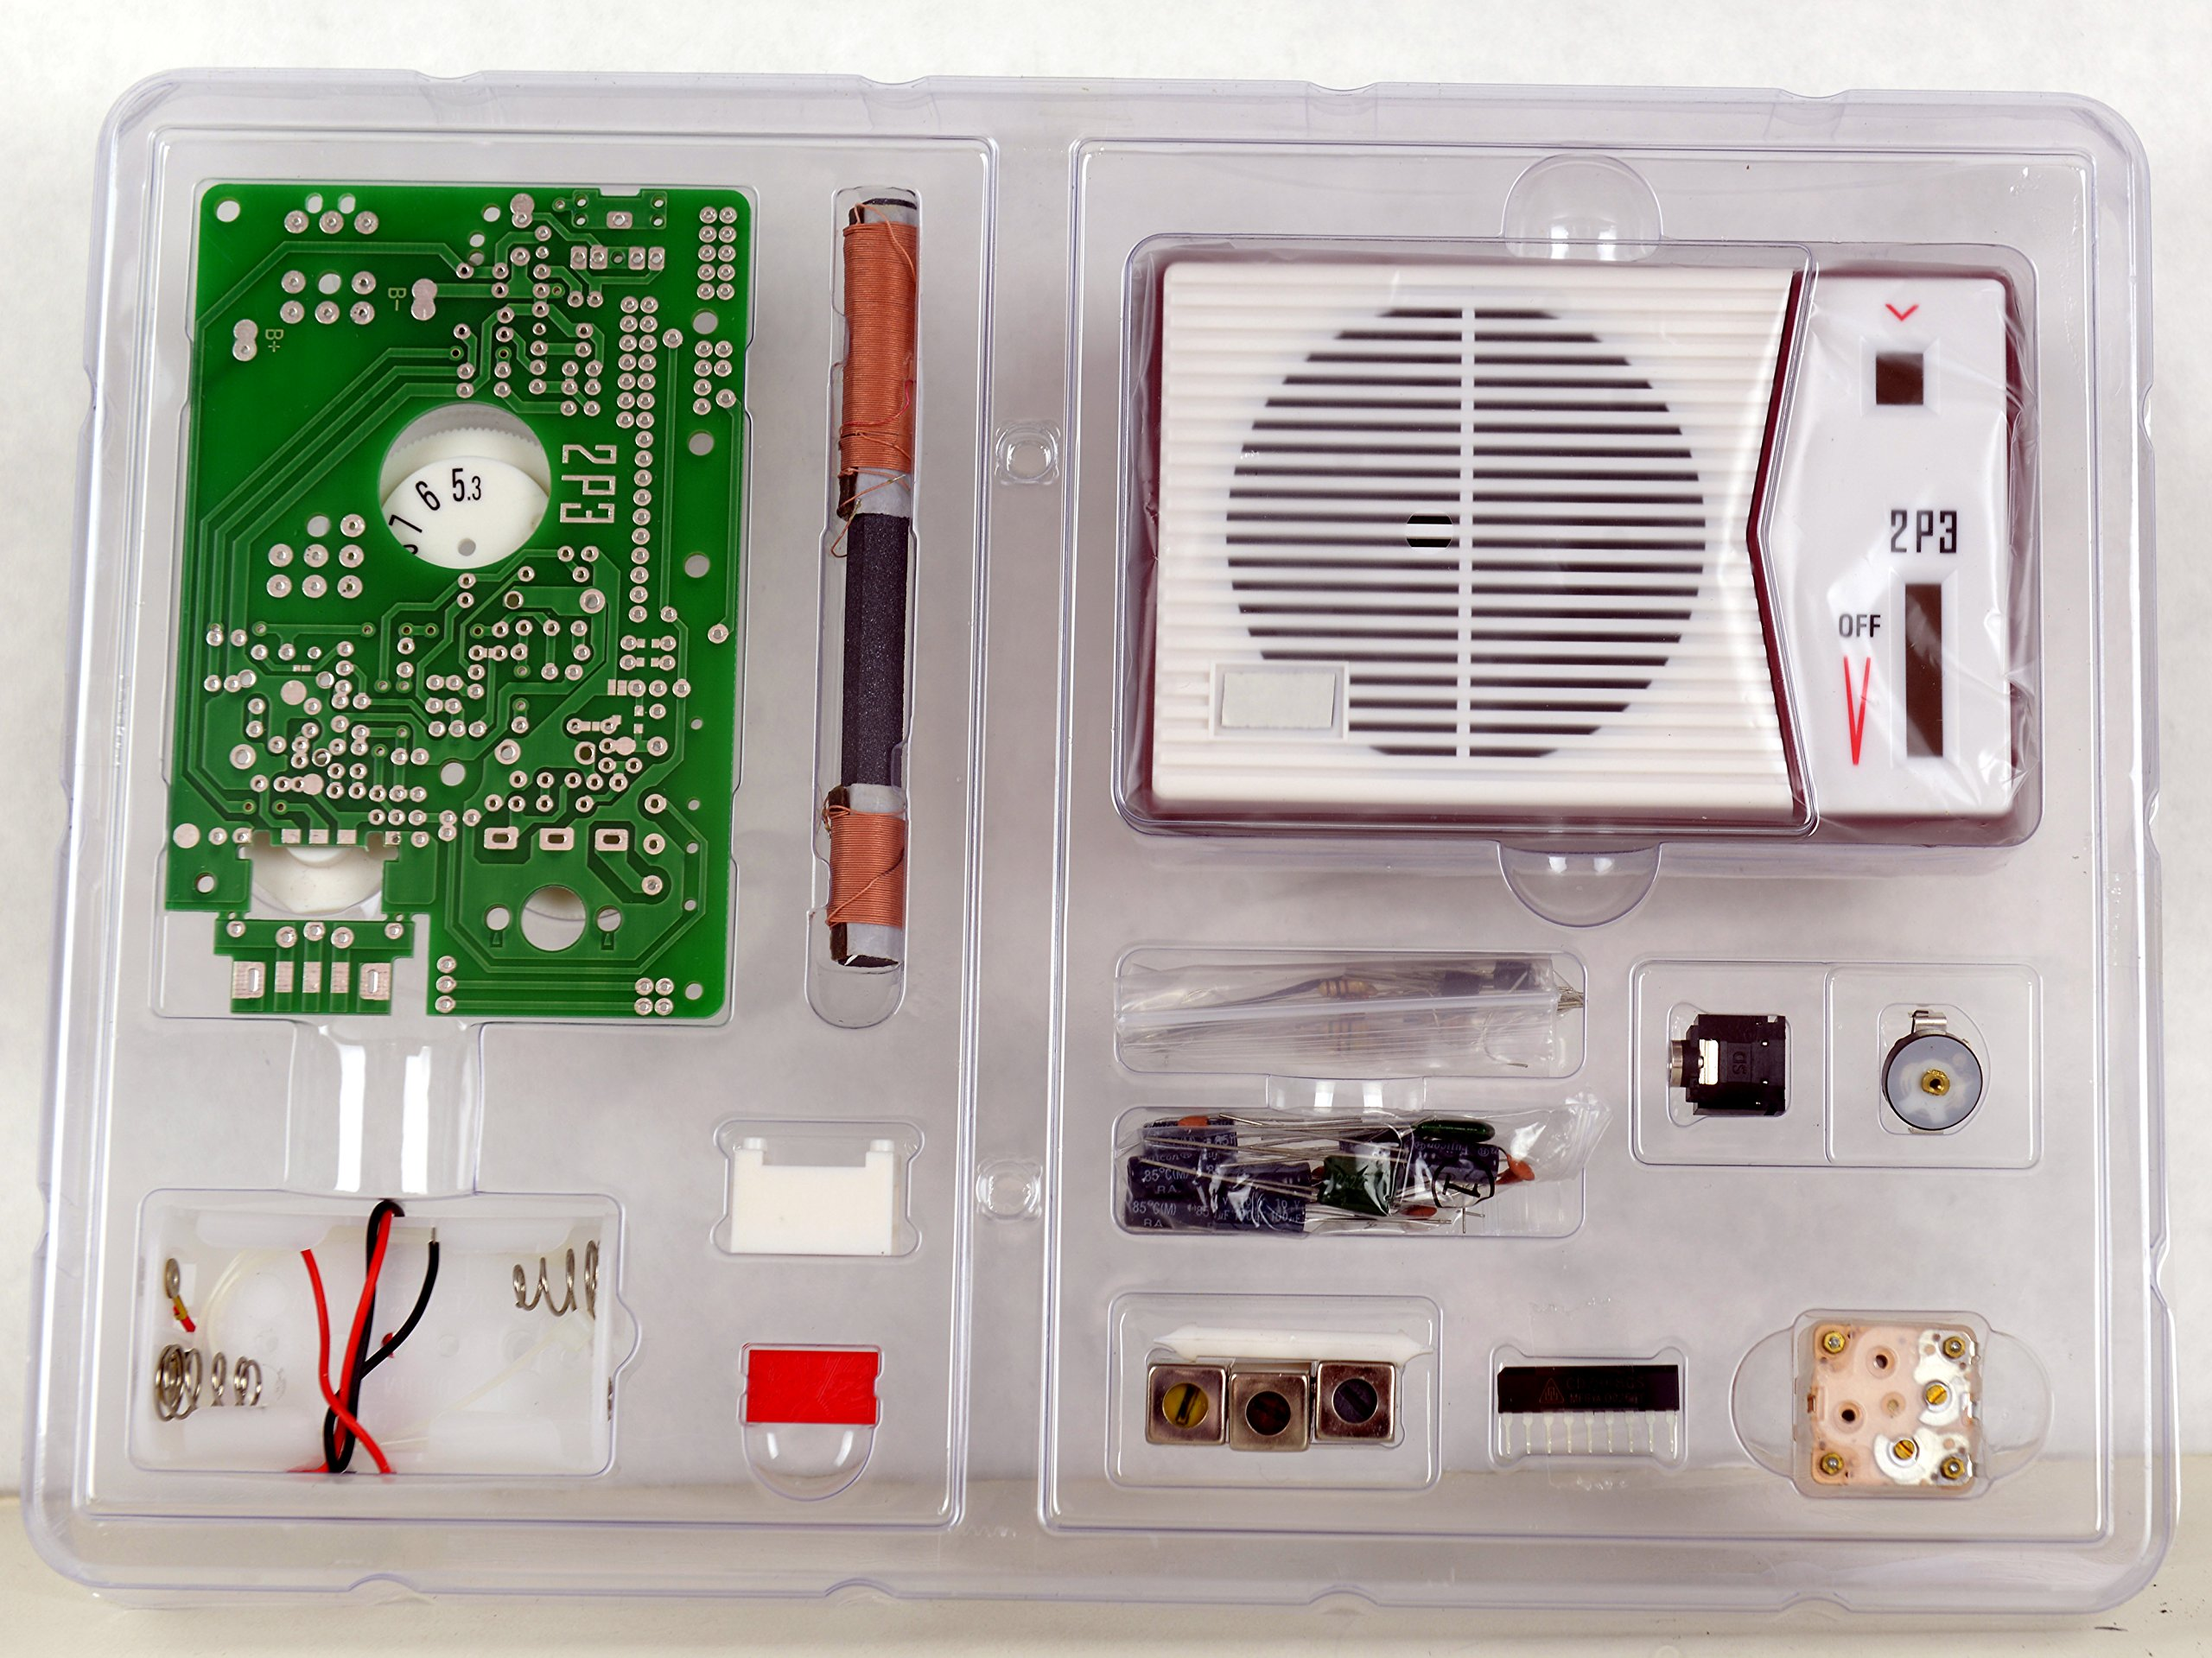 Tecsun 2P3 AM Radio Receiver Kit - DIY for Enthusiasts, Built it into a radio case ! by TECSUN